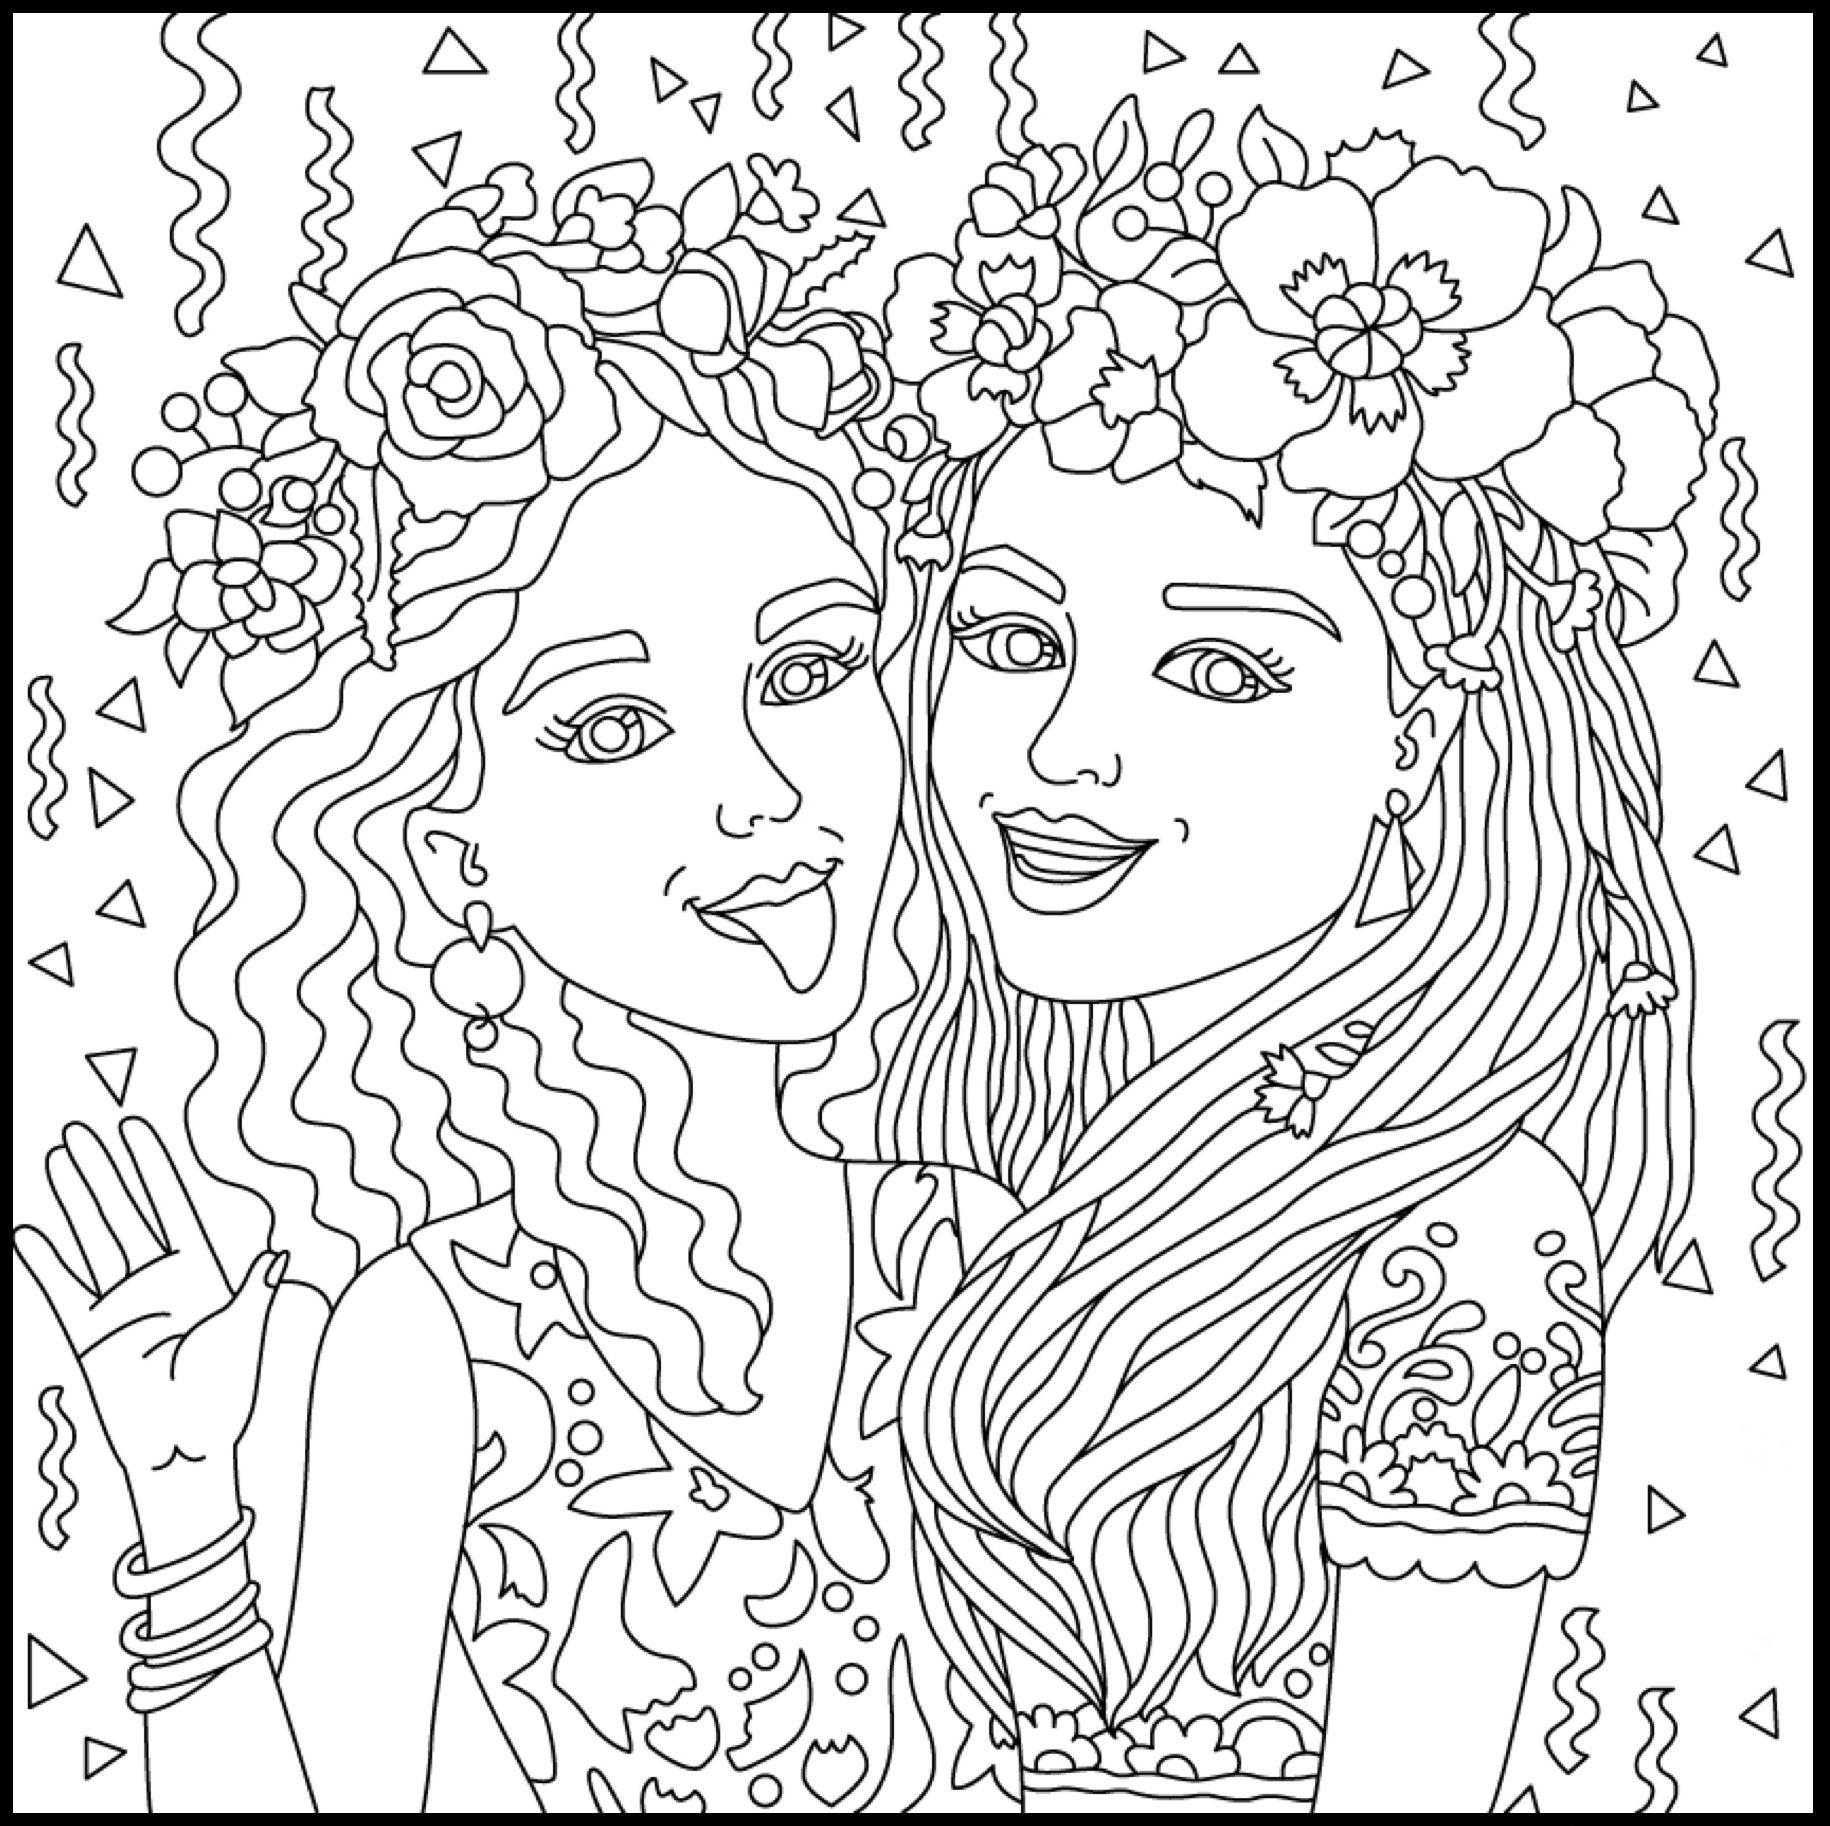 Pin By Vero On Color Me Please Emoji Coloring Pages Coloring Pages Coloring Pages For Girls